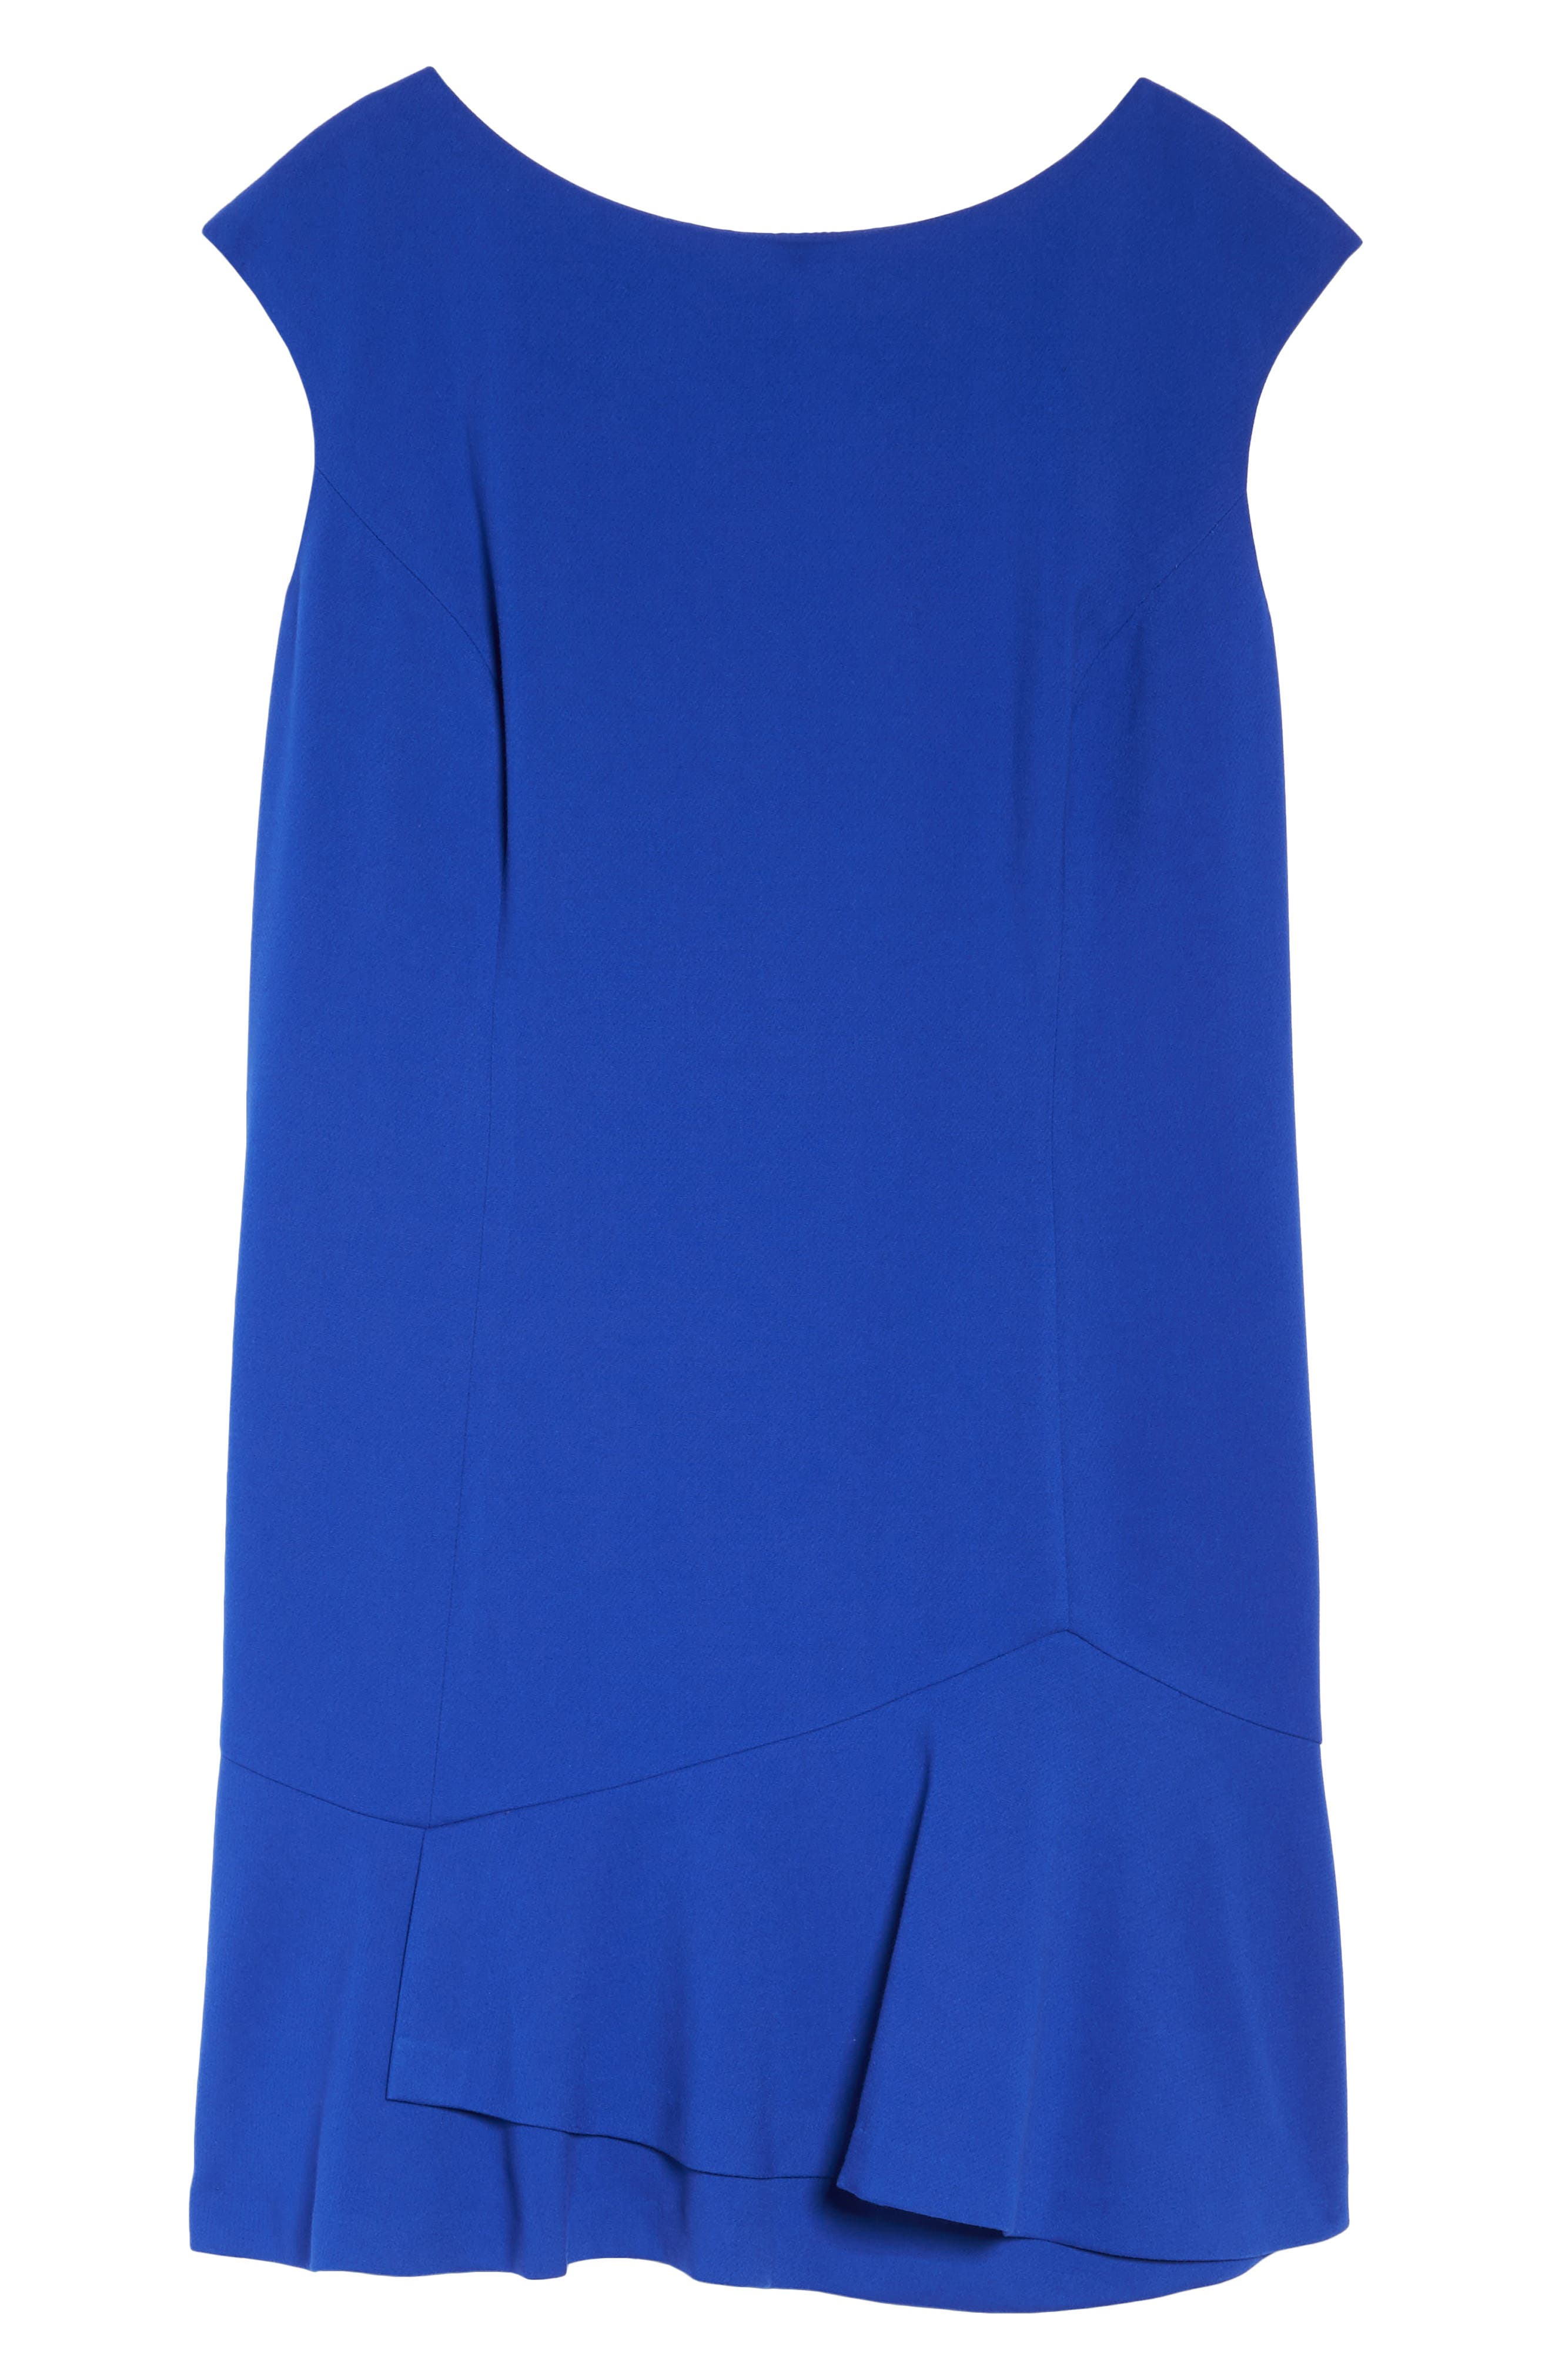 Drop Waist Dress,                             Alternate thumbnail 6, color,                             430